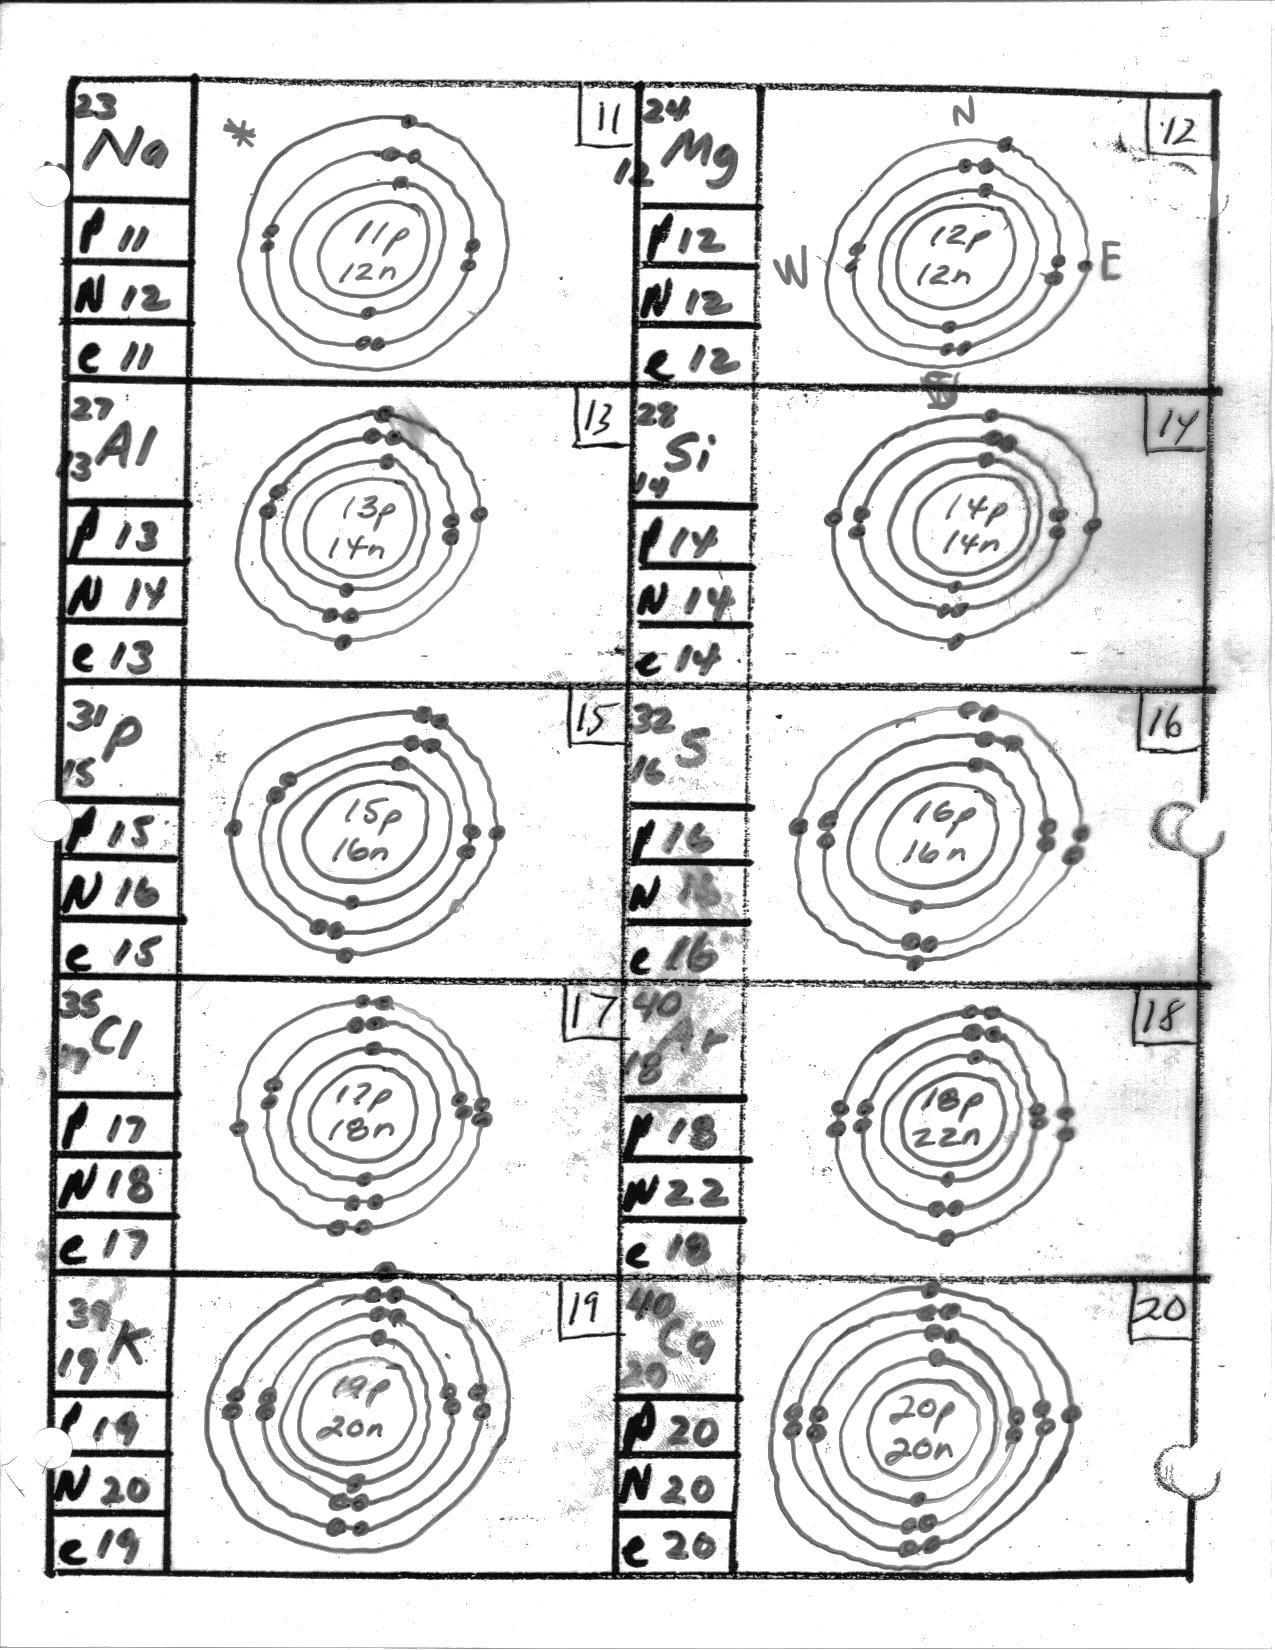 Printables Bohr Model Worksheet Messygracebook Thousands